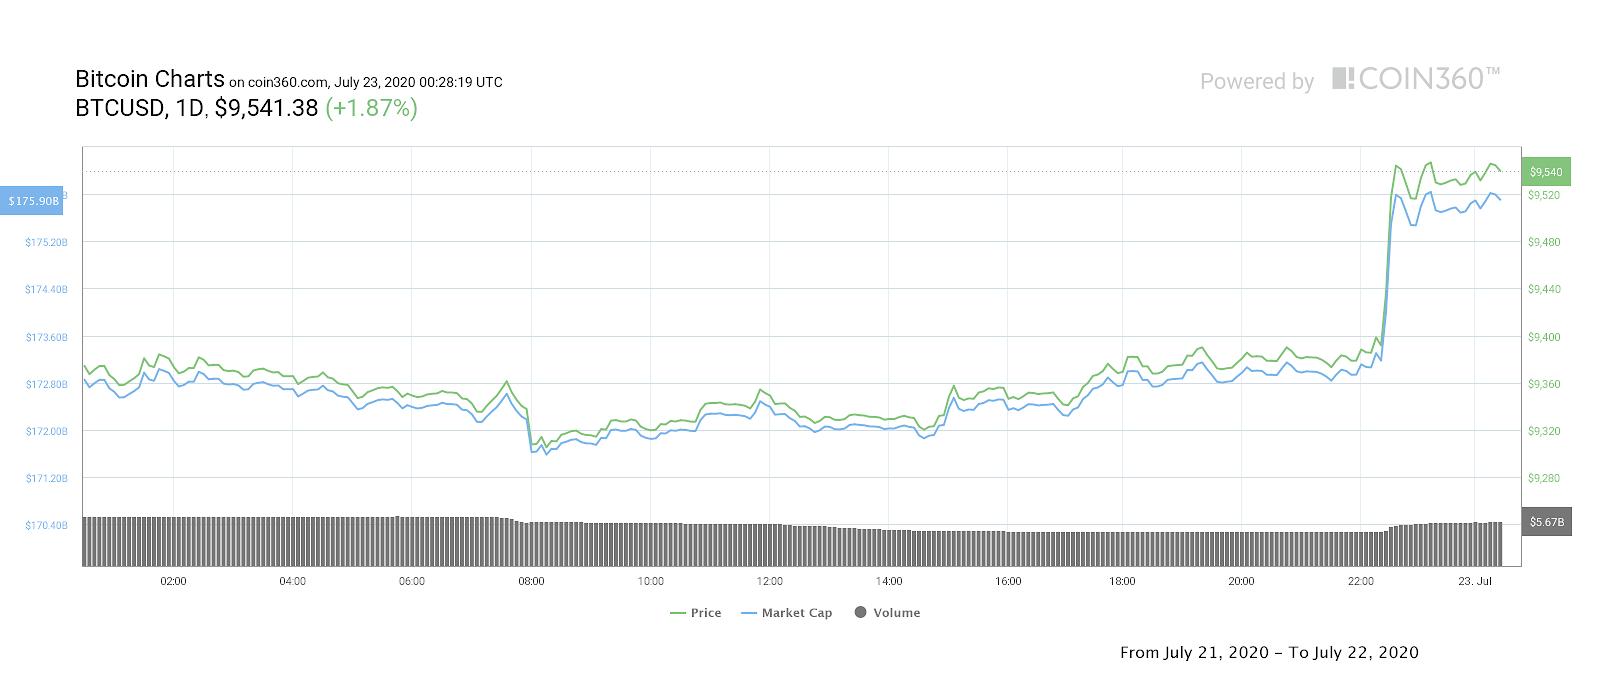 Bitcoin daily price chart